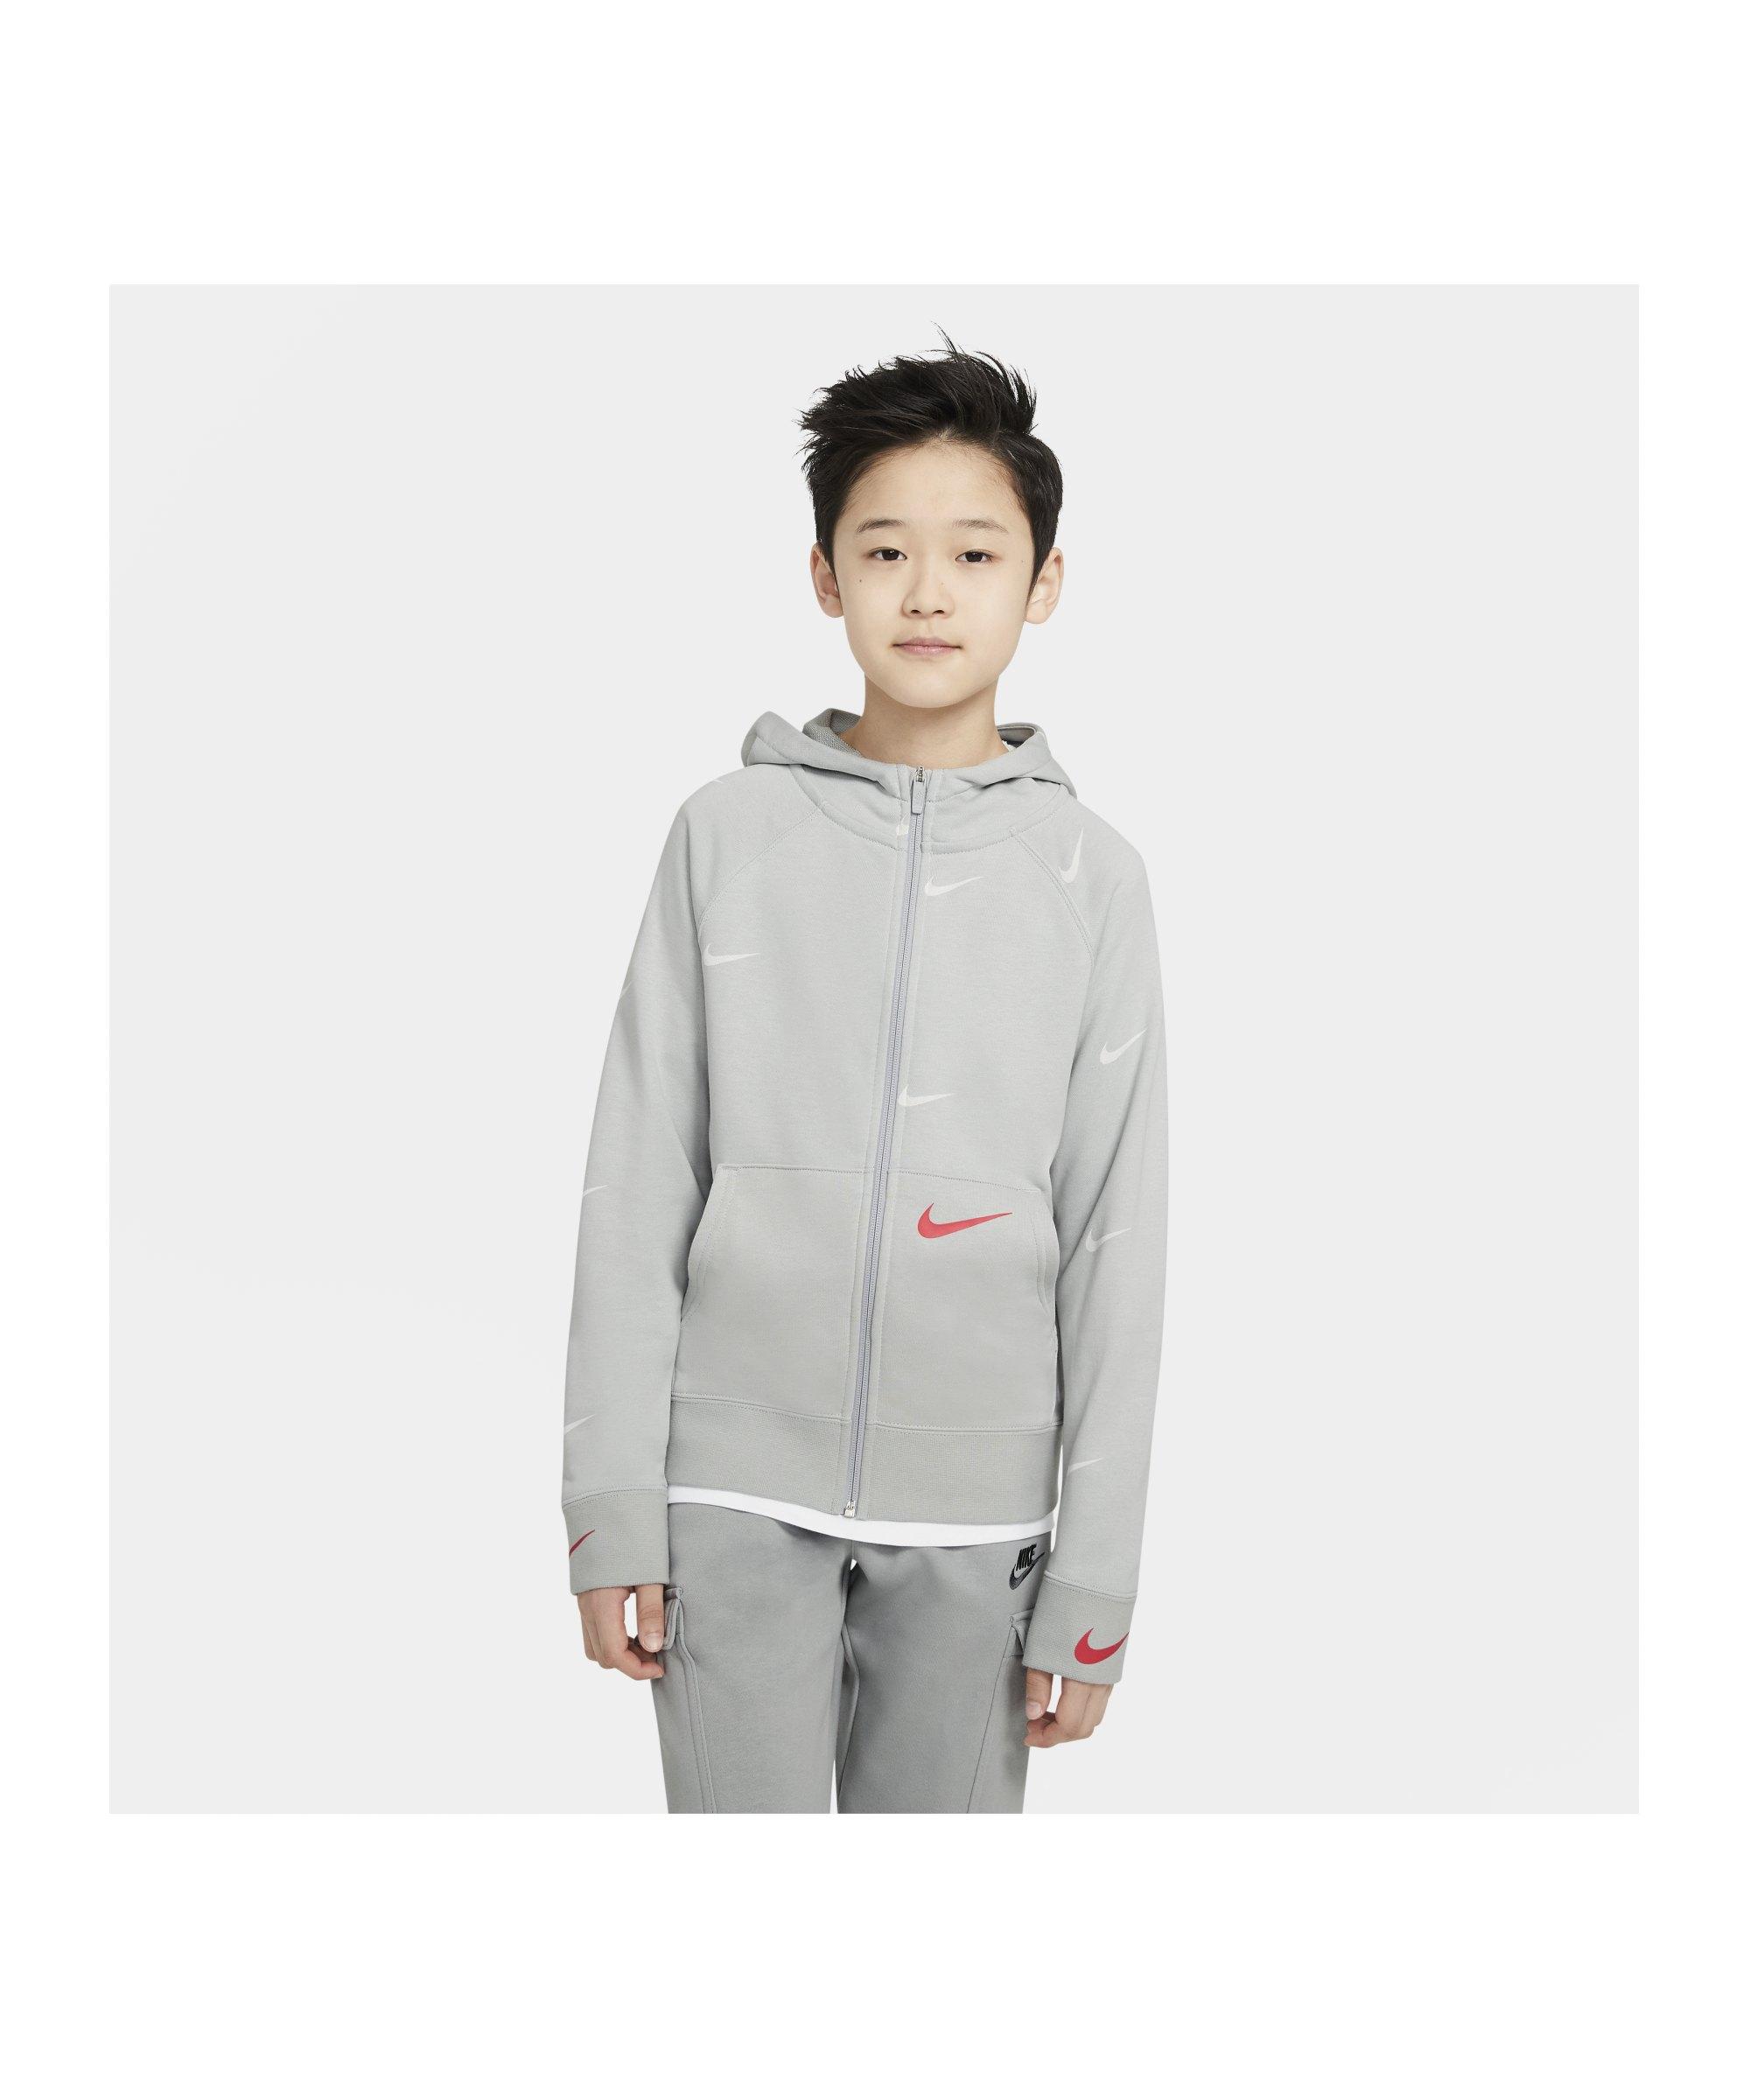 Nike Swoosh Kapuzenjacke Kids Grau F097 - grau